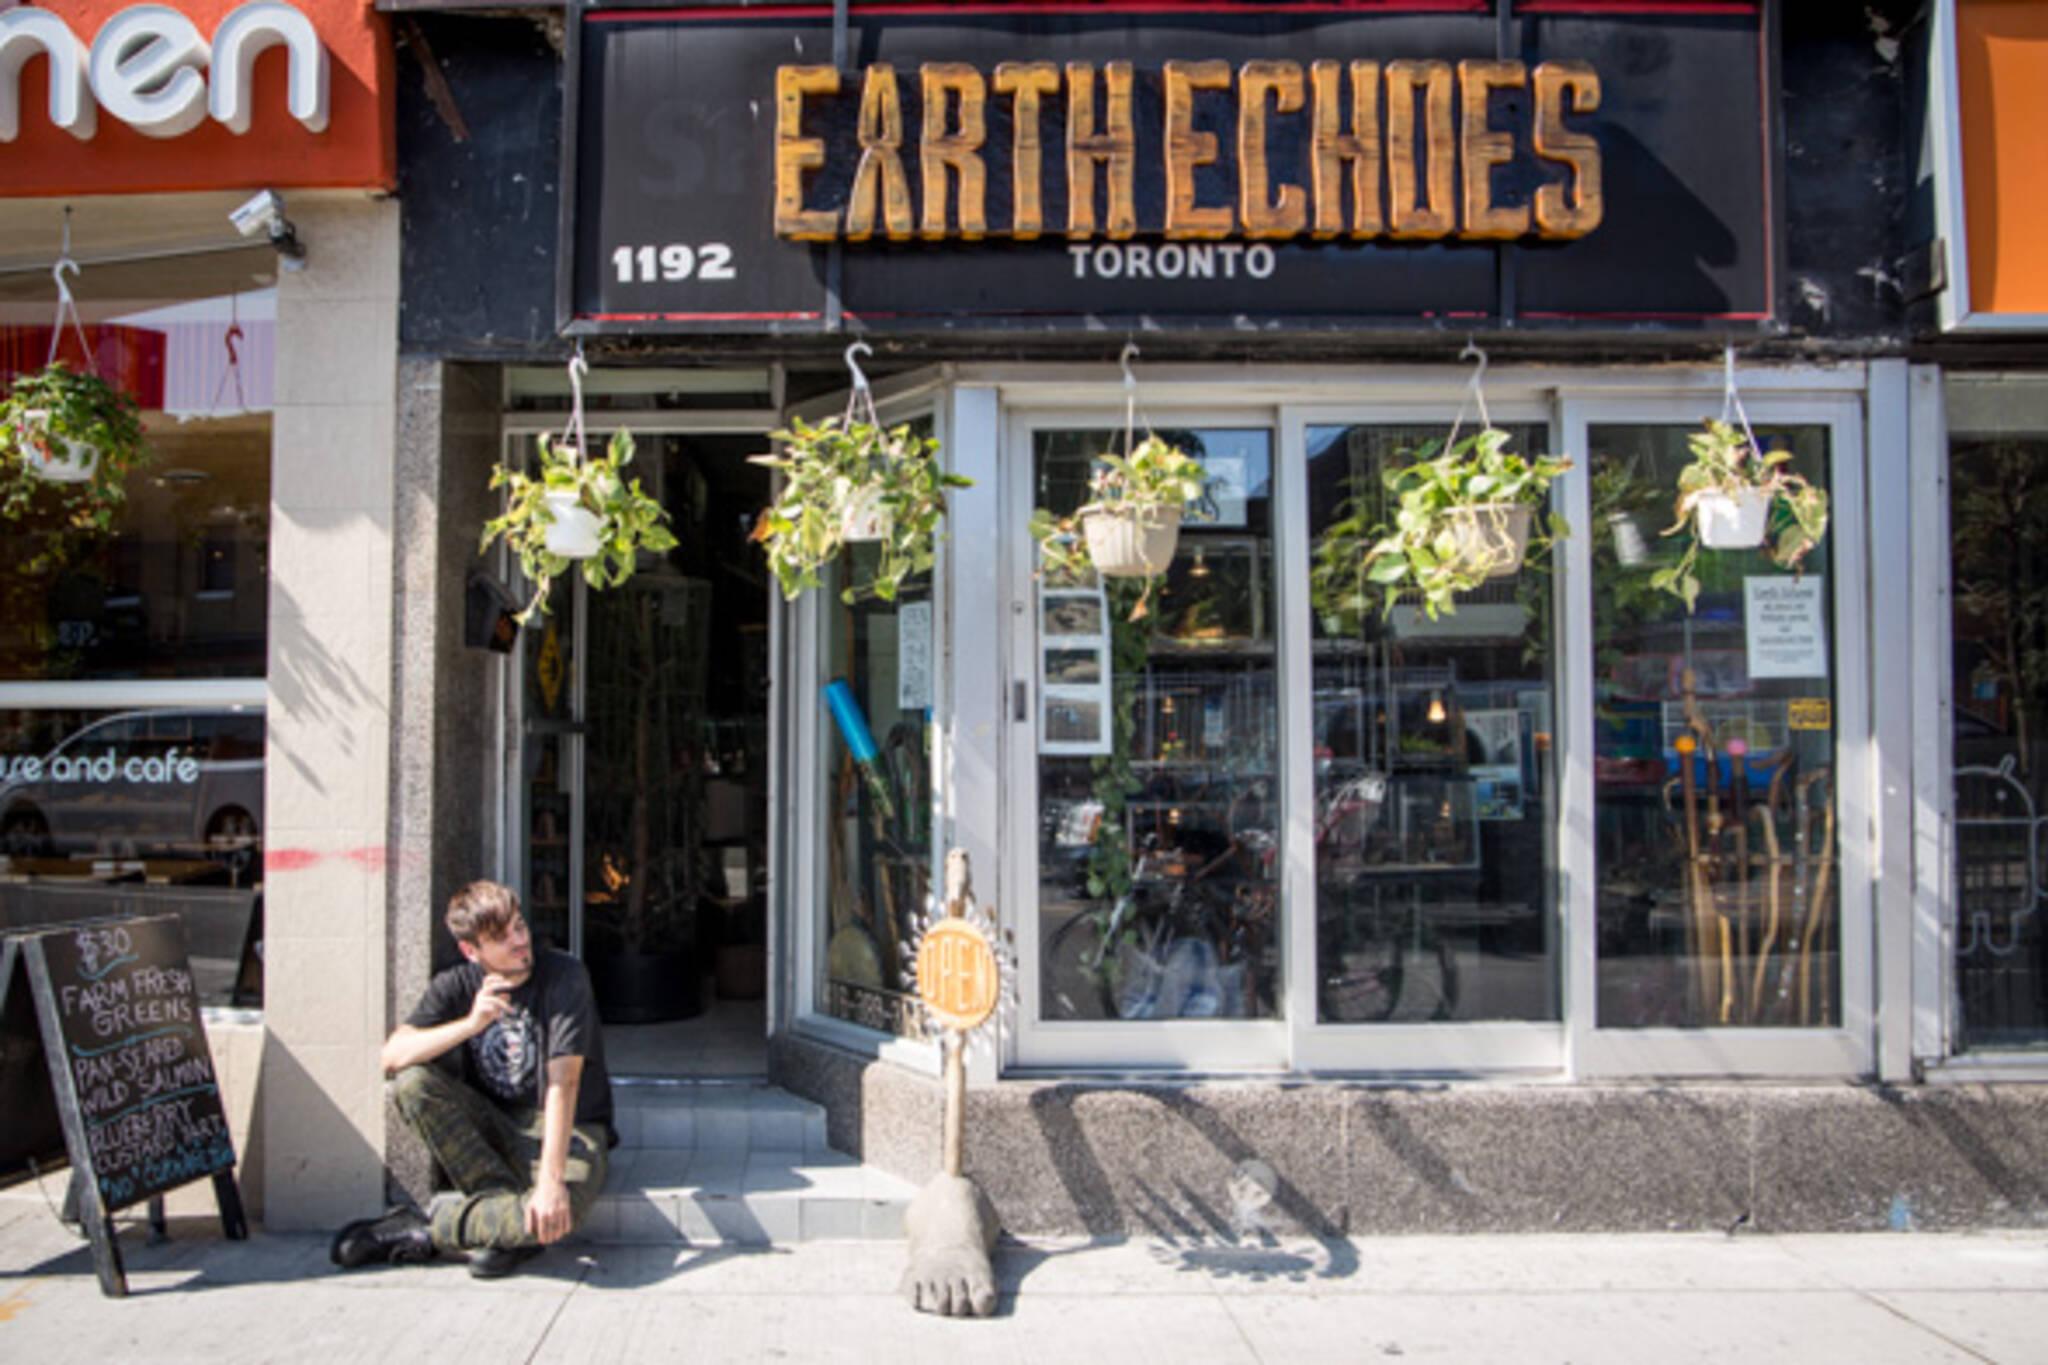 earth echoes toronto